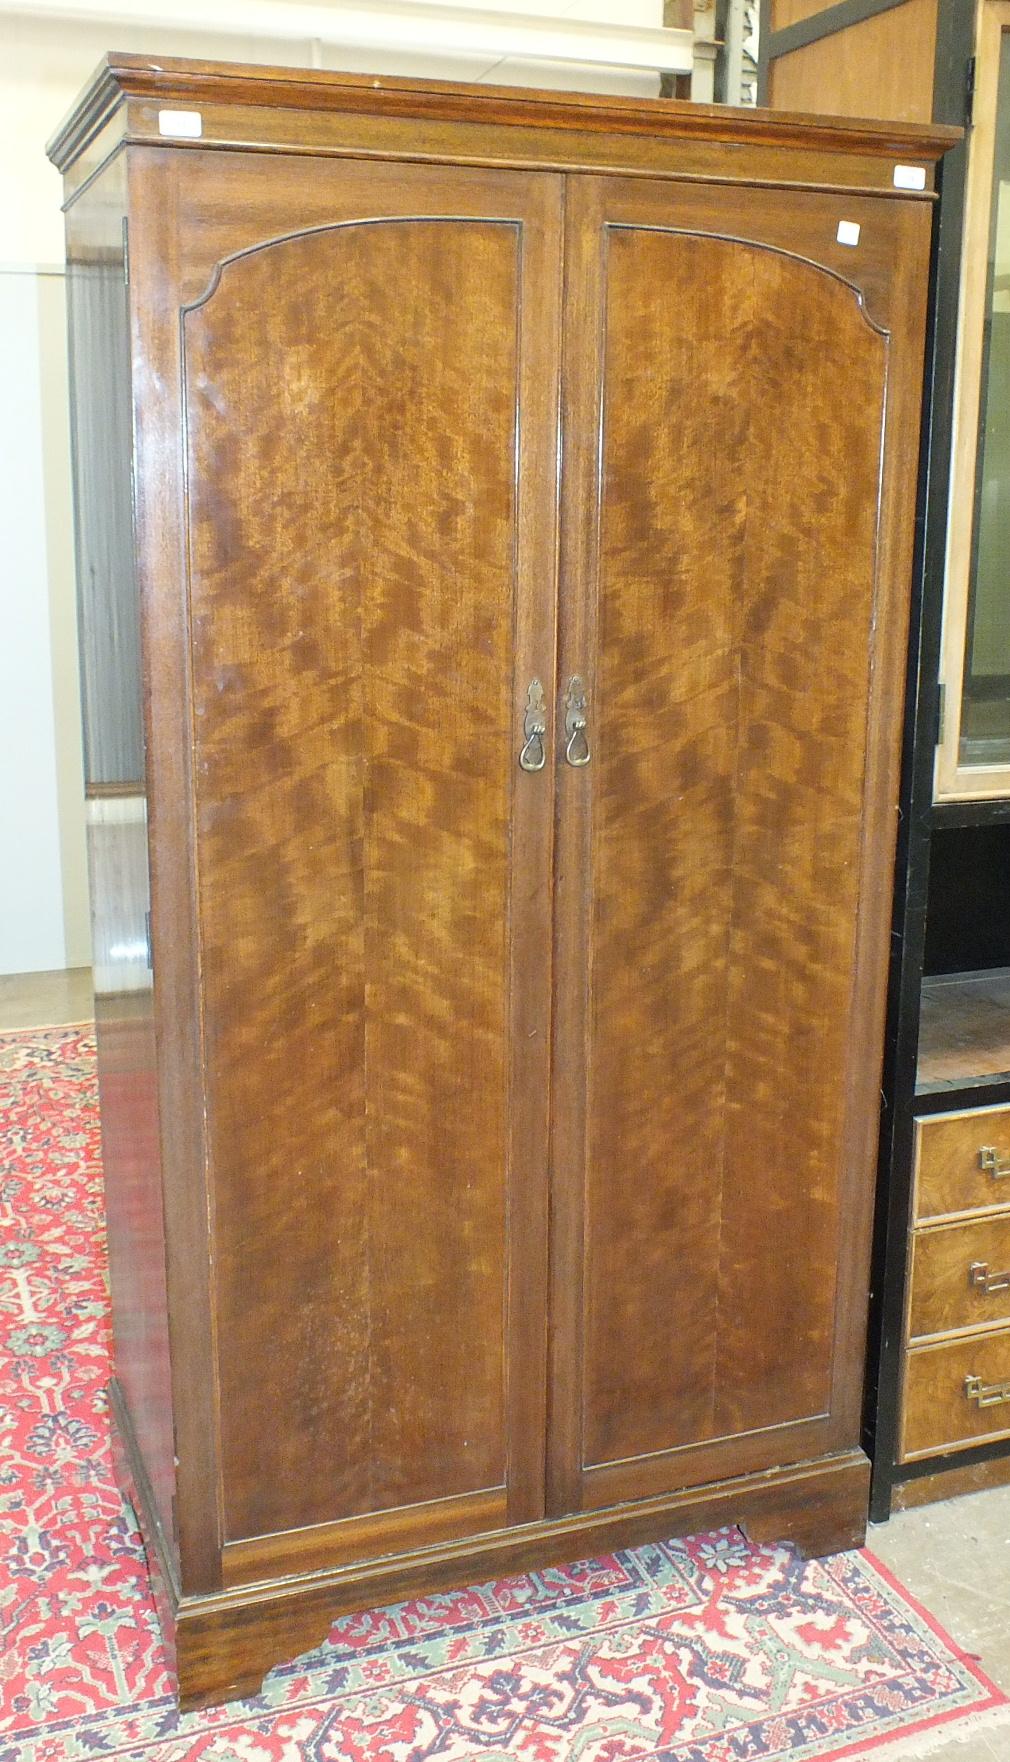 Lot 18 - A mid-20th century walnut two-door wardrobe, 95.5cm wide.